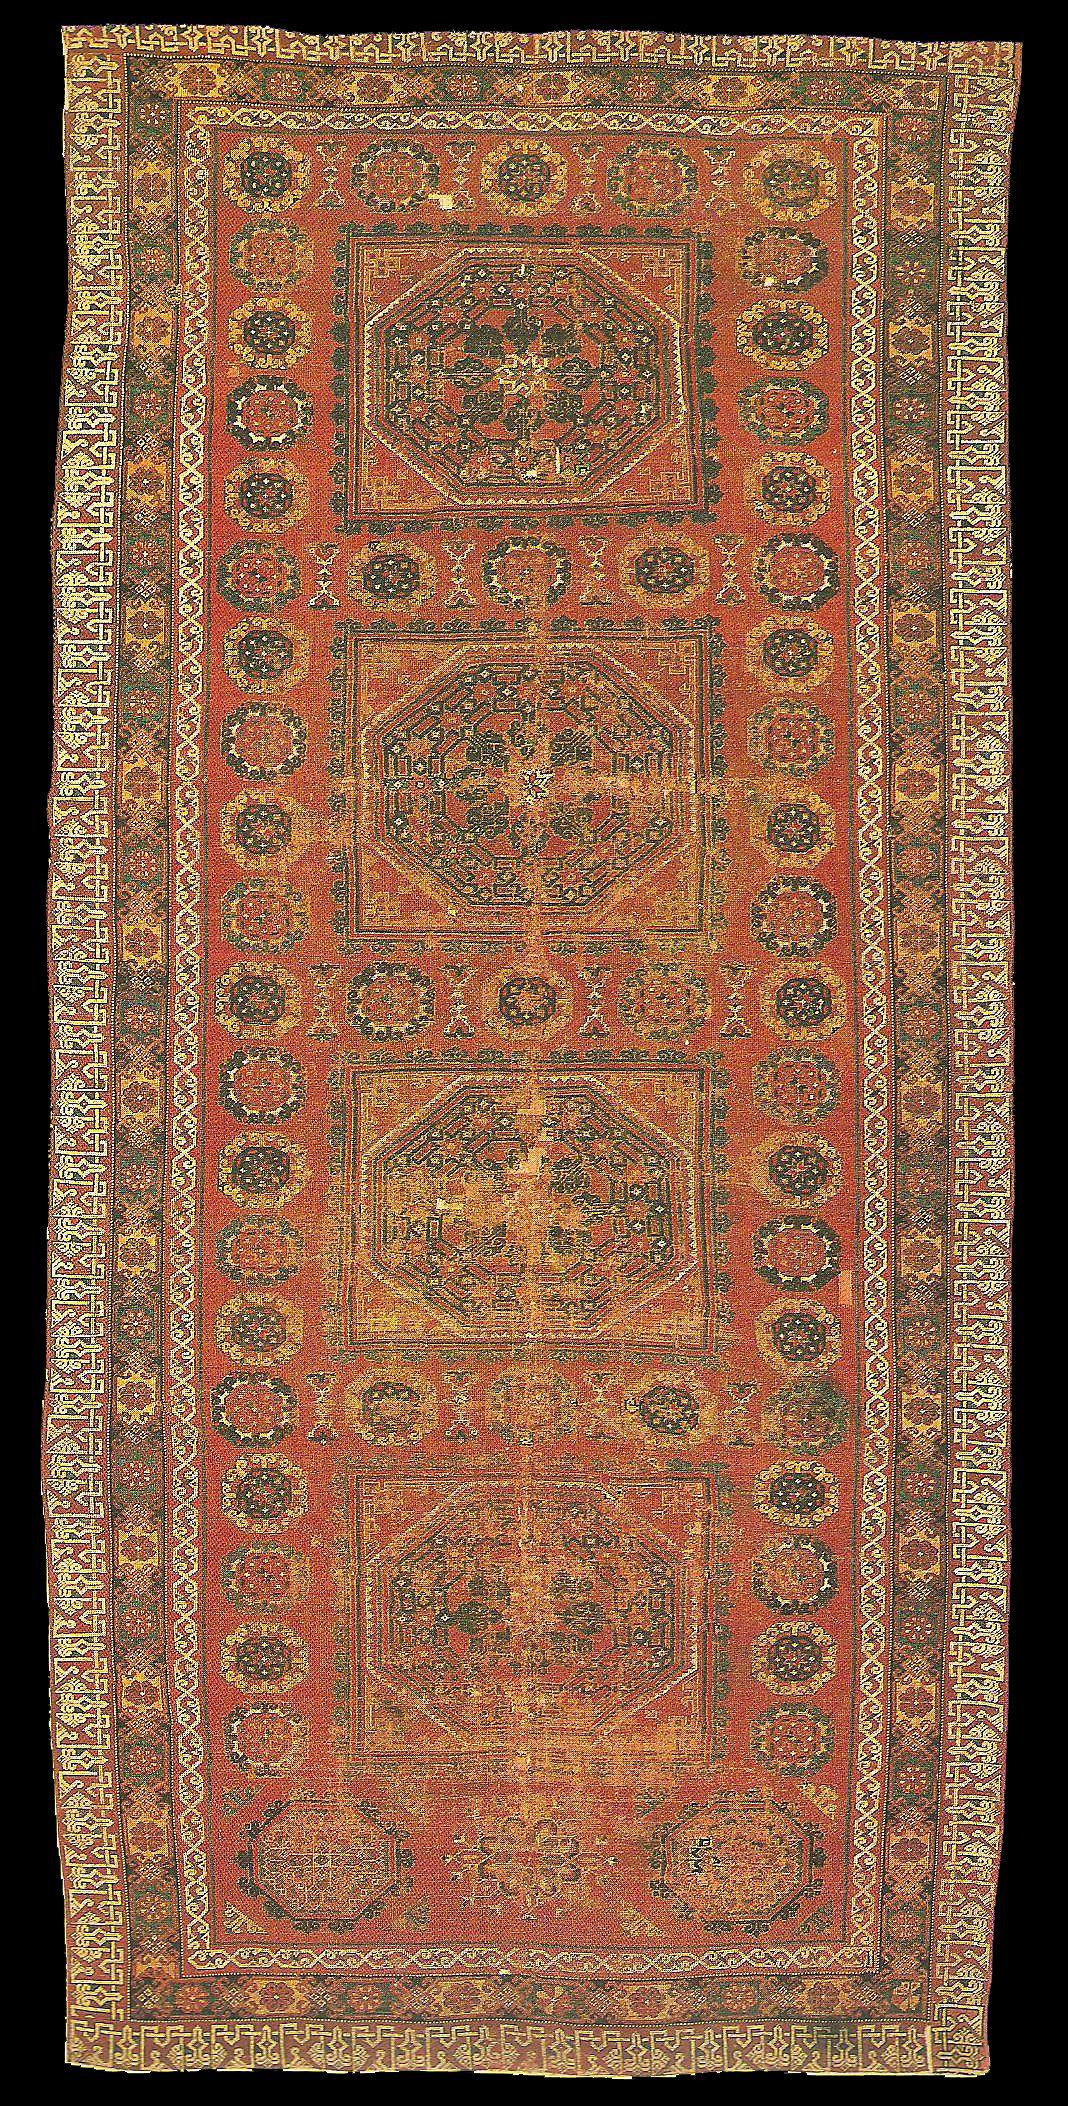 16th Century Turkish Carpet Museum Fur Islamische Kunst Berlin No I 5526 Size 200x430cm